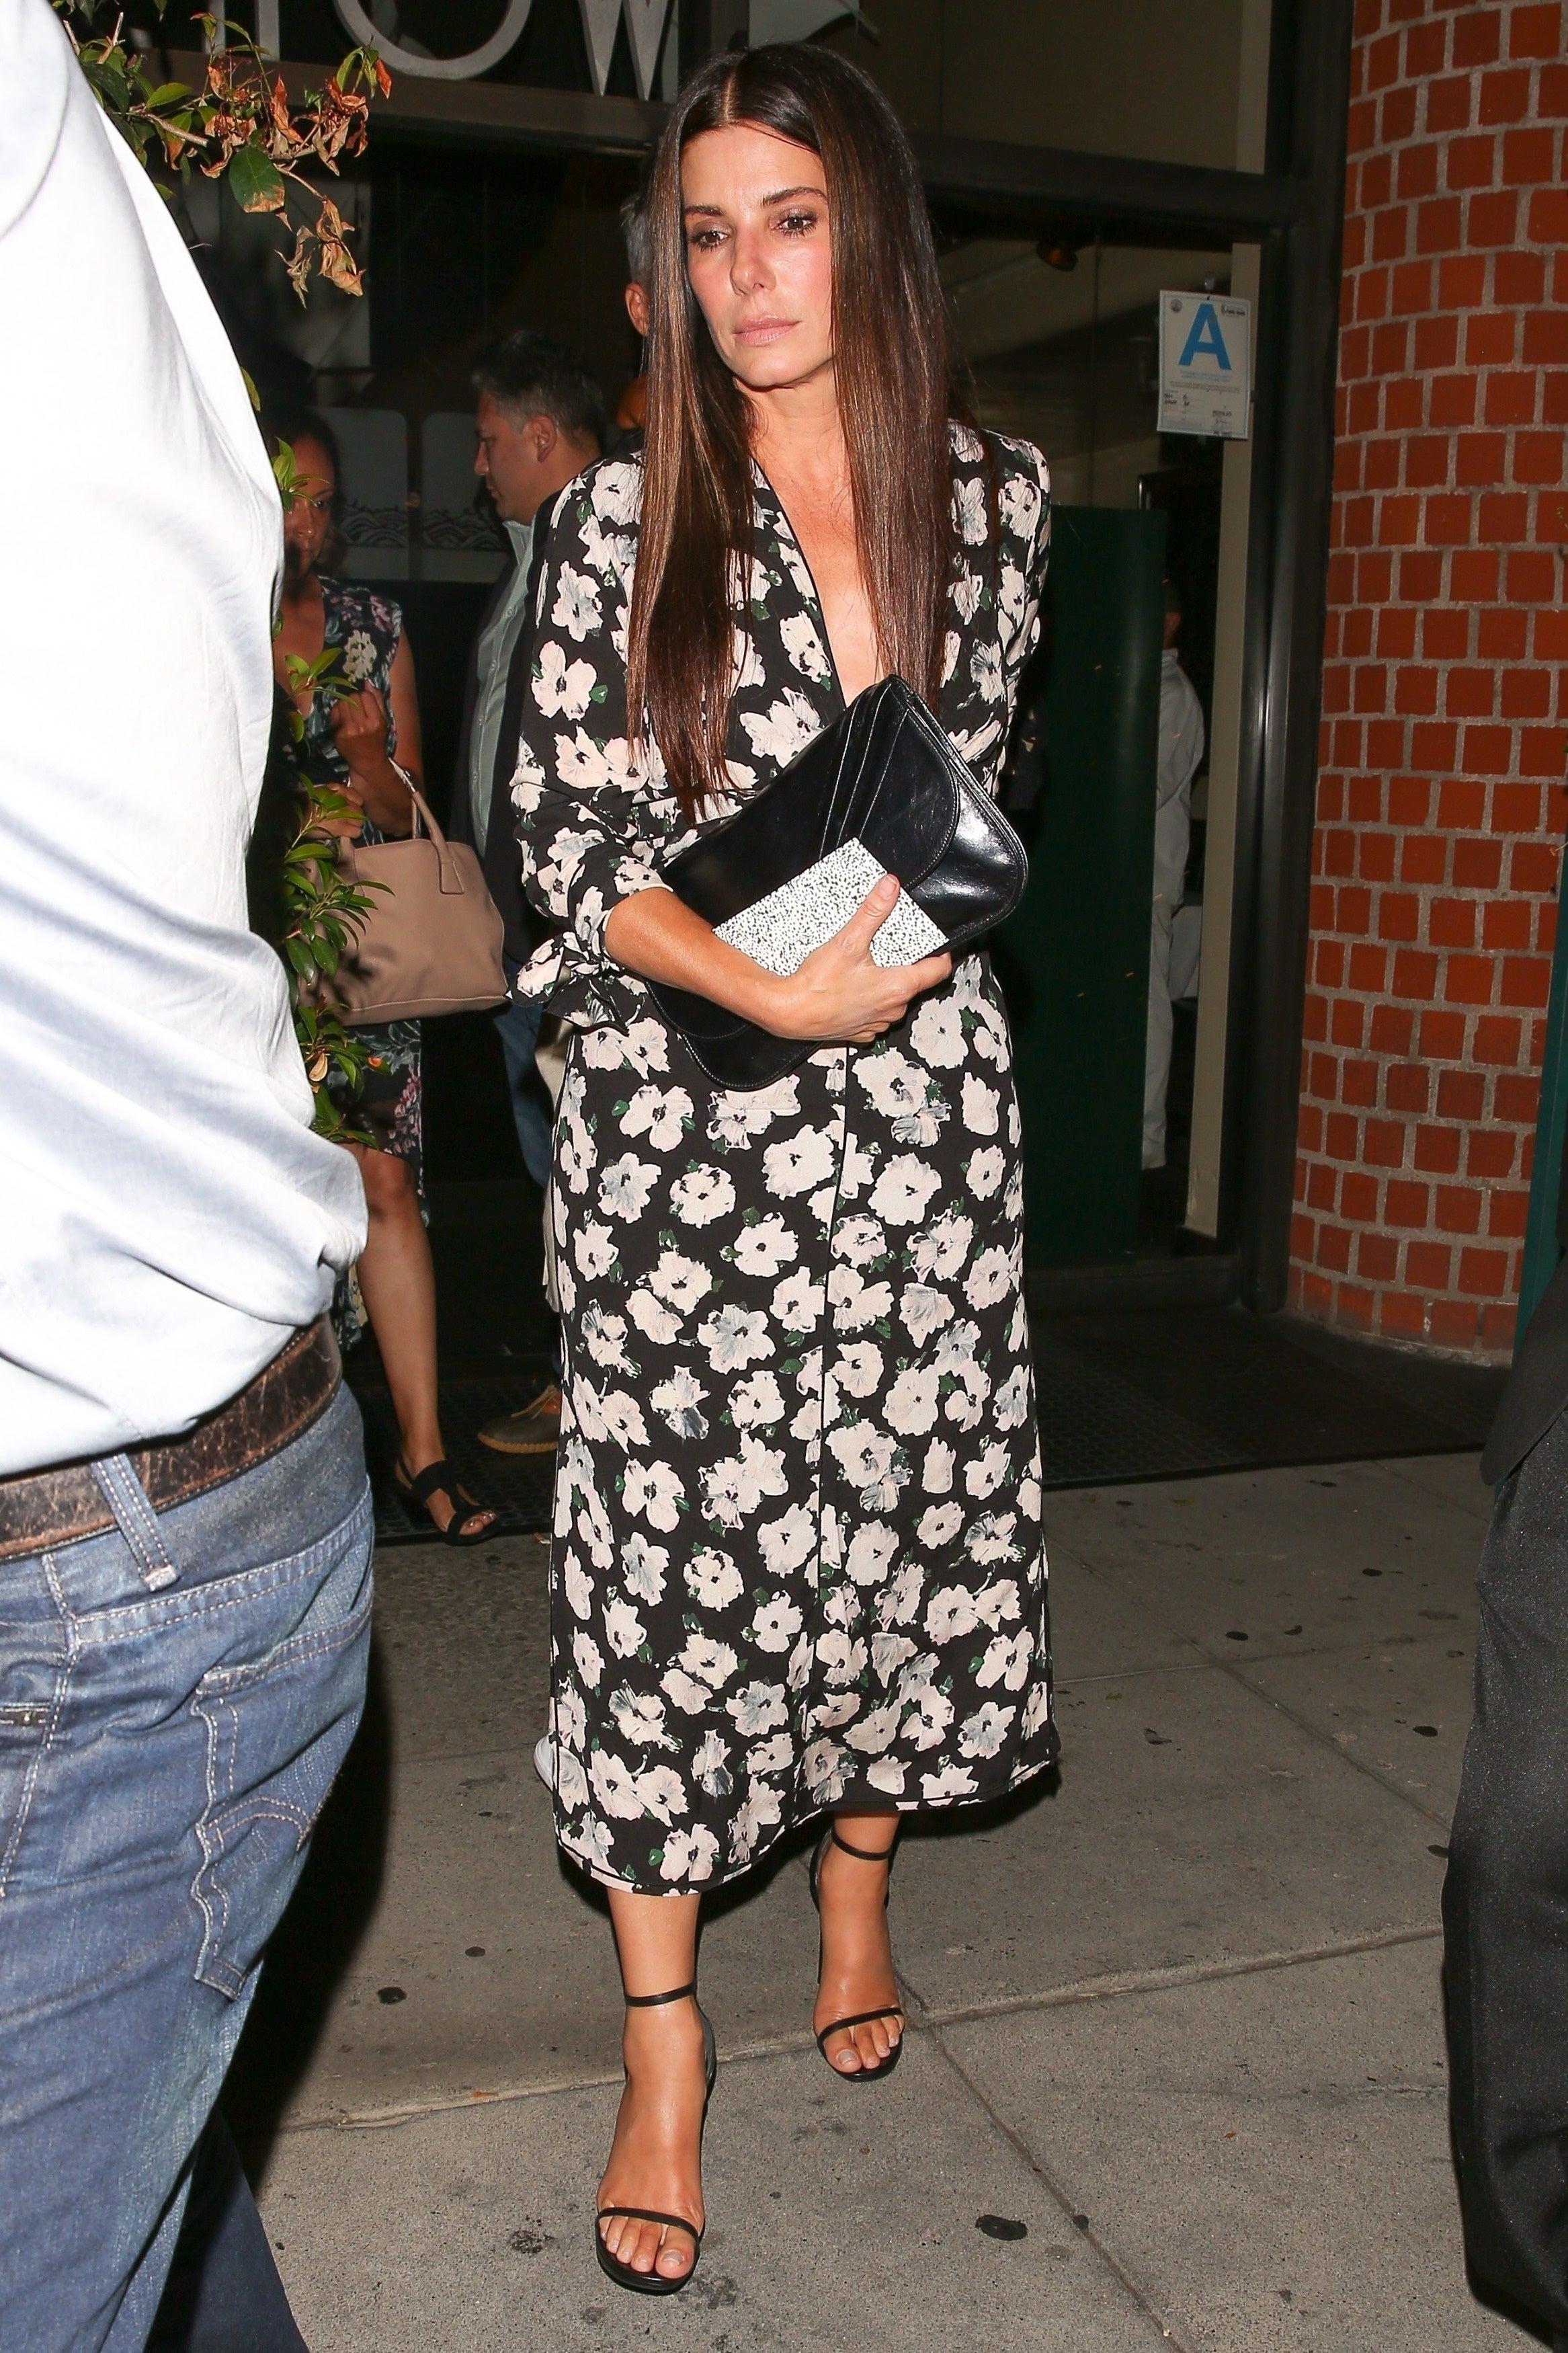 Boyfriend sandra bullock 2018 Sexiest Actress